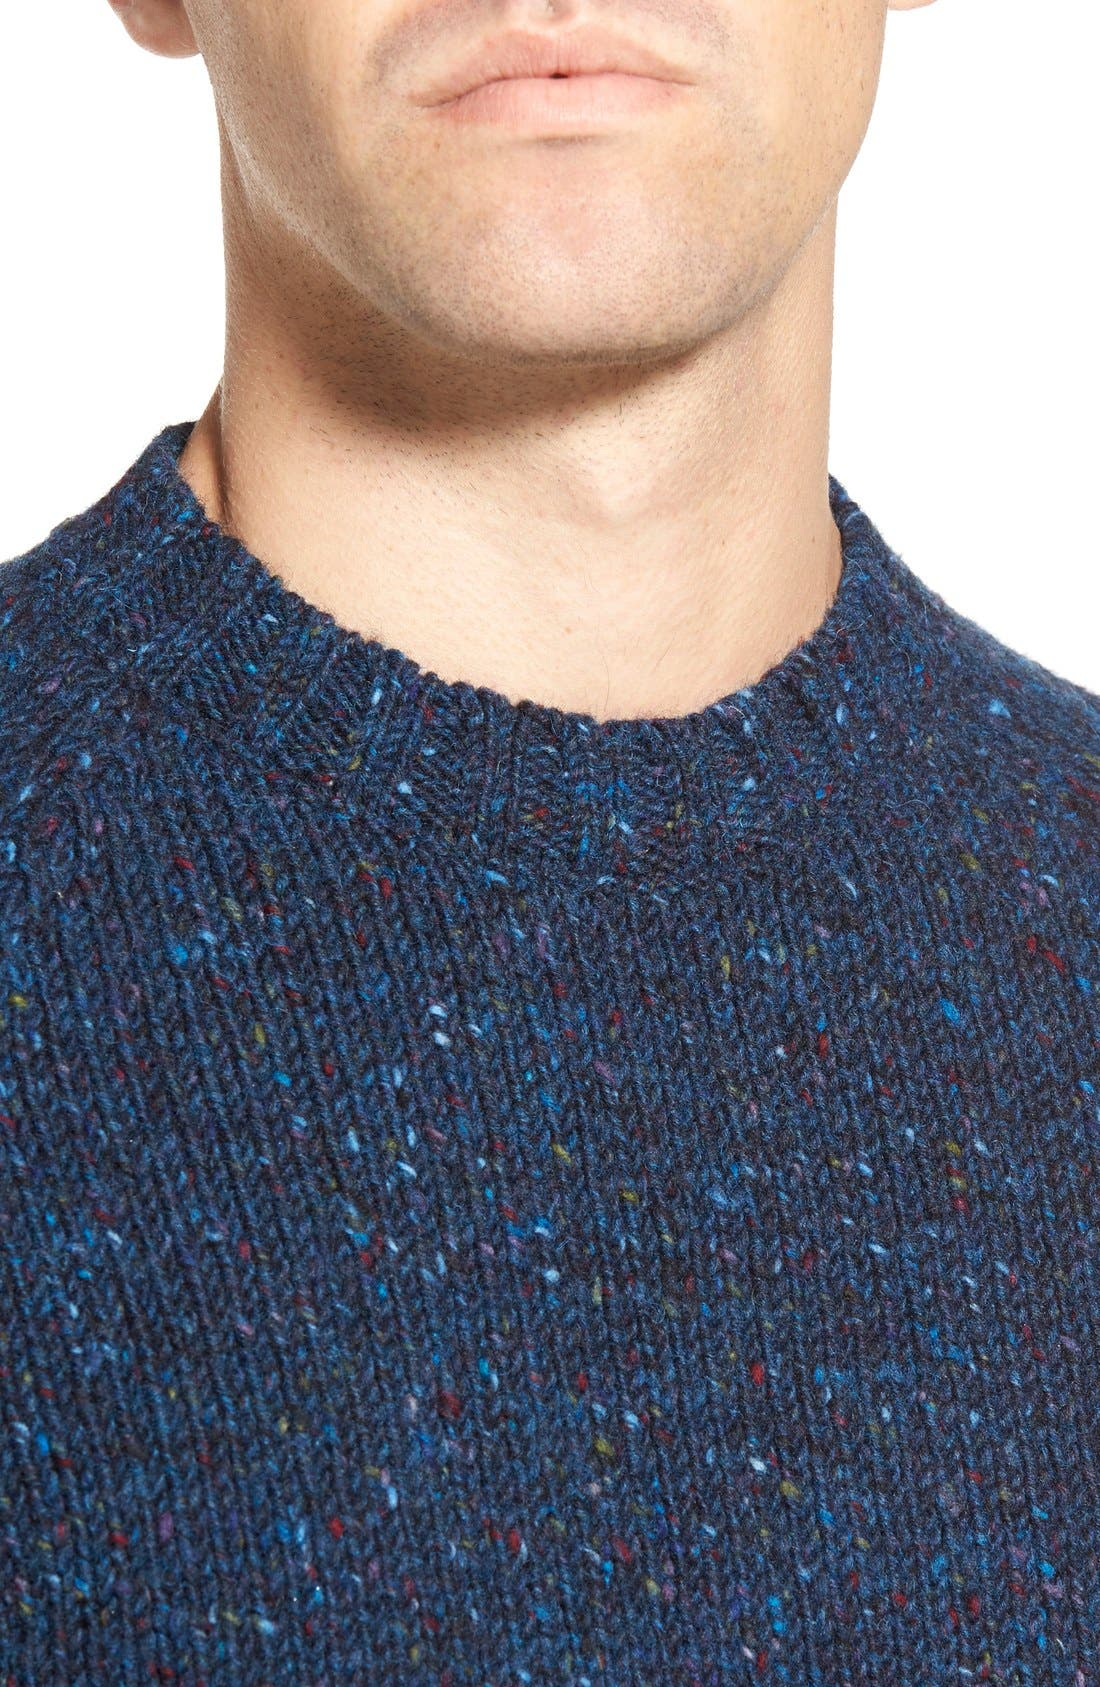 'Netherby' Kilcara Tweed Crewneck Sweater,                             Alternate thumbnail 3, color,                             400